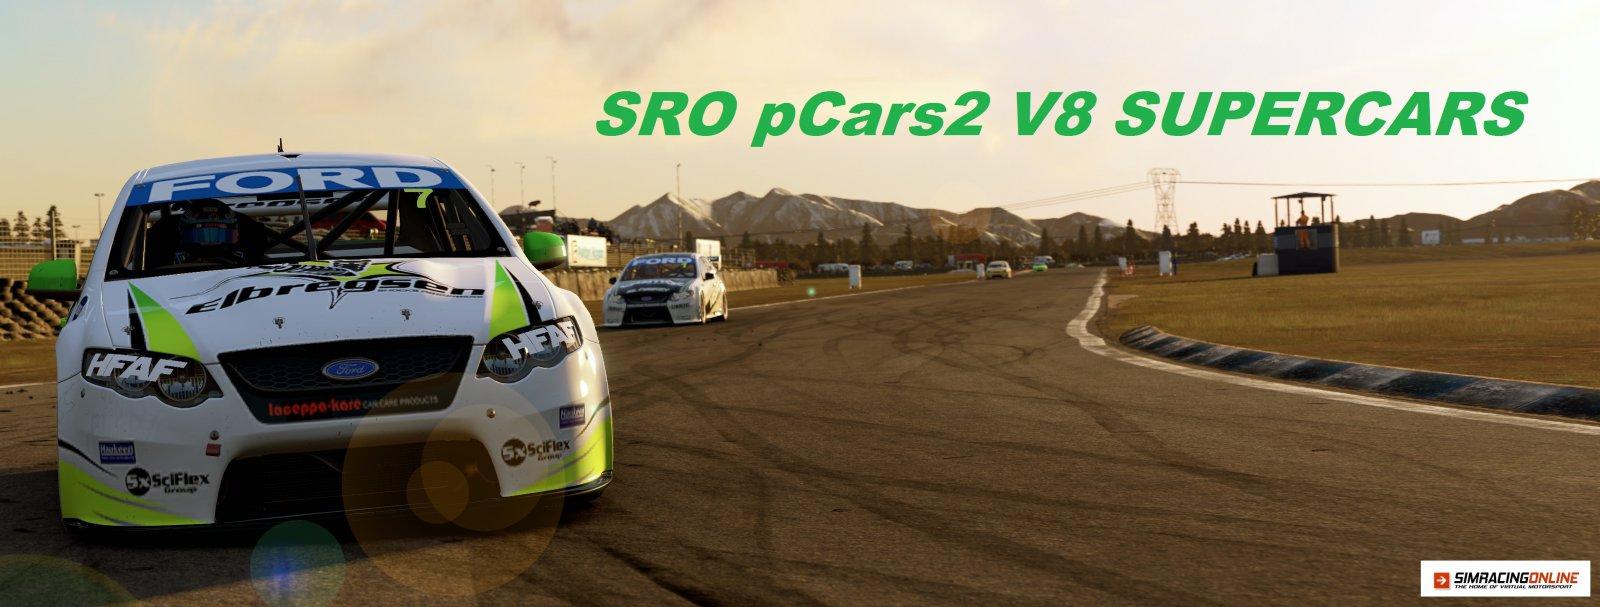 Project CARS 2 Screenshot 2017.11.19 - 17.18.09.47.jpg